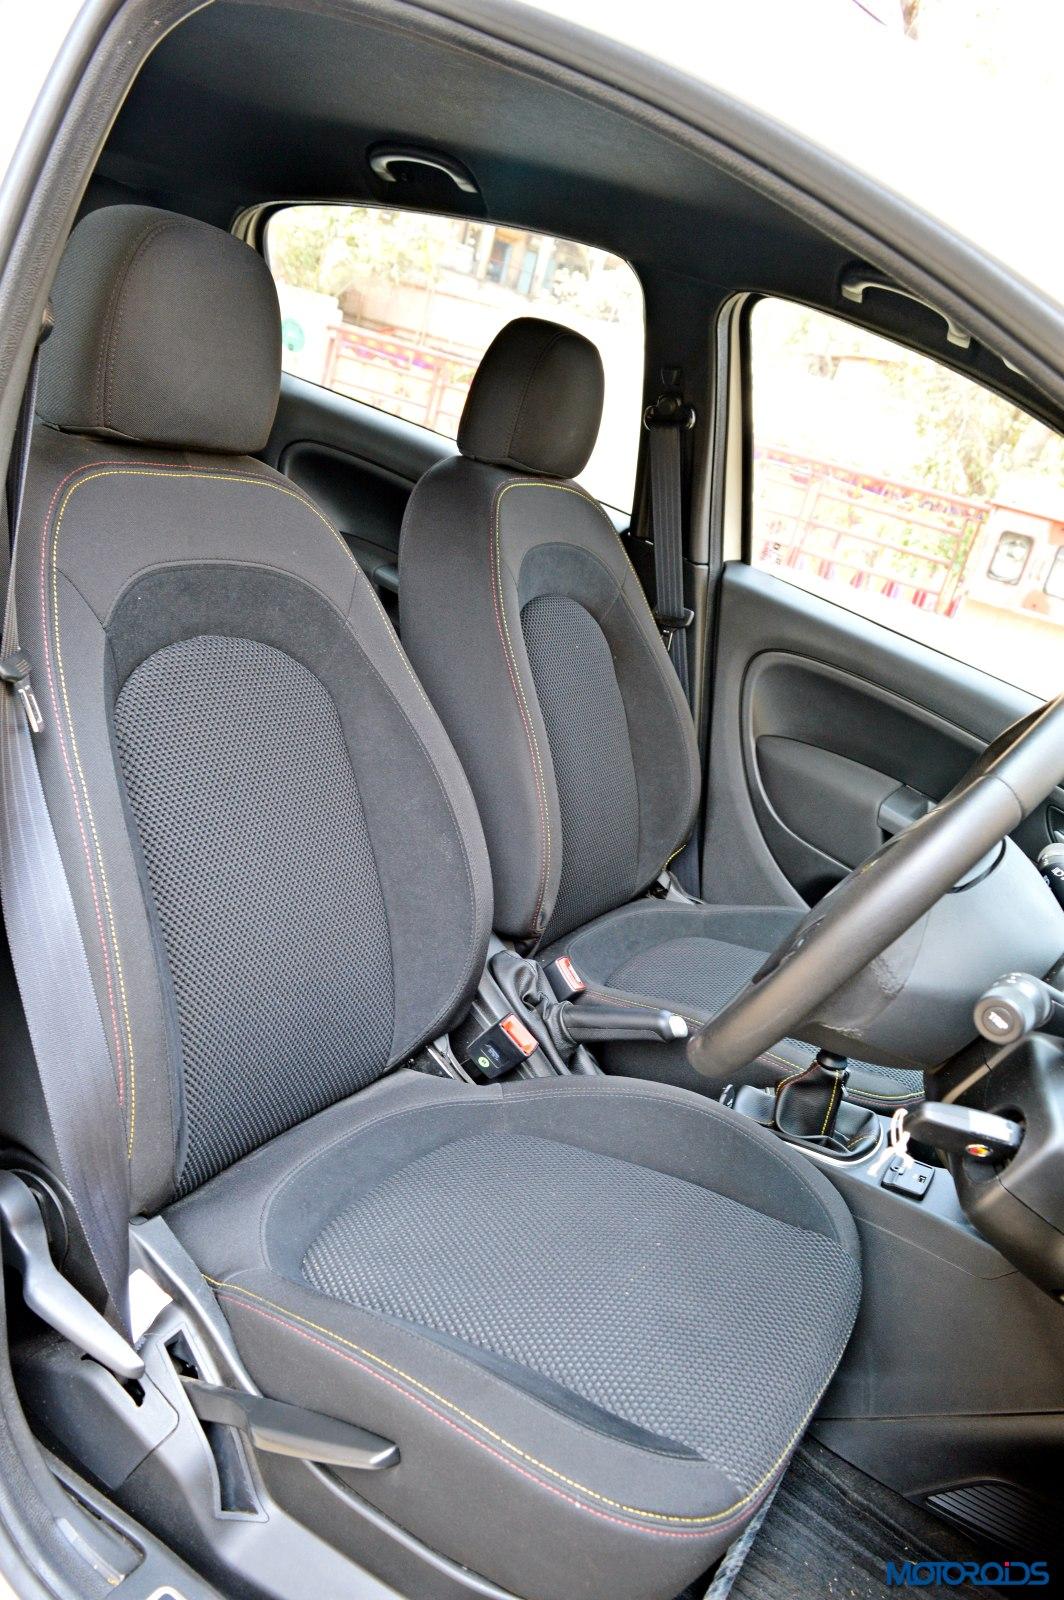 Fiat Punto Abarth Front Seats 54